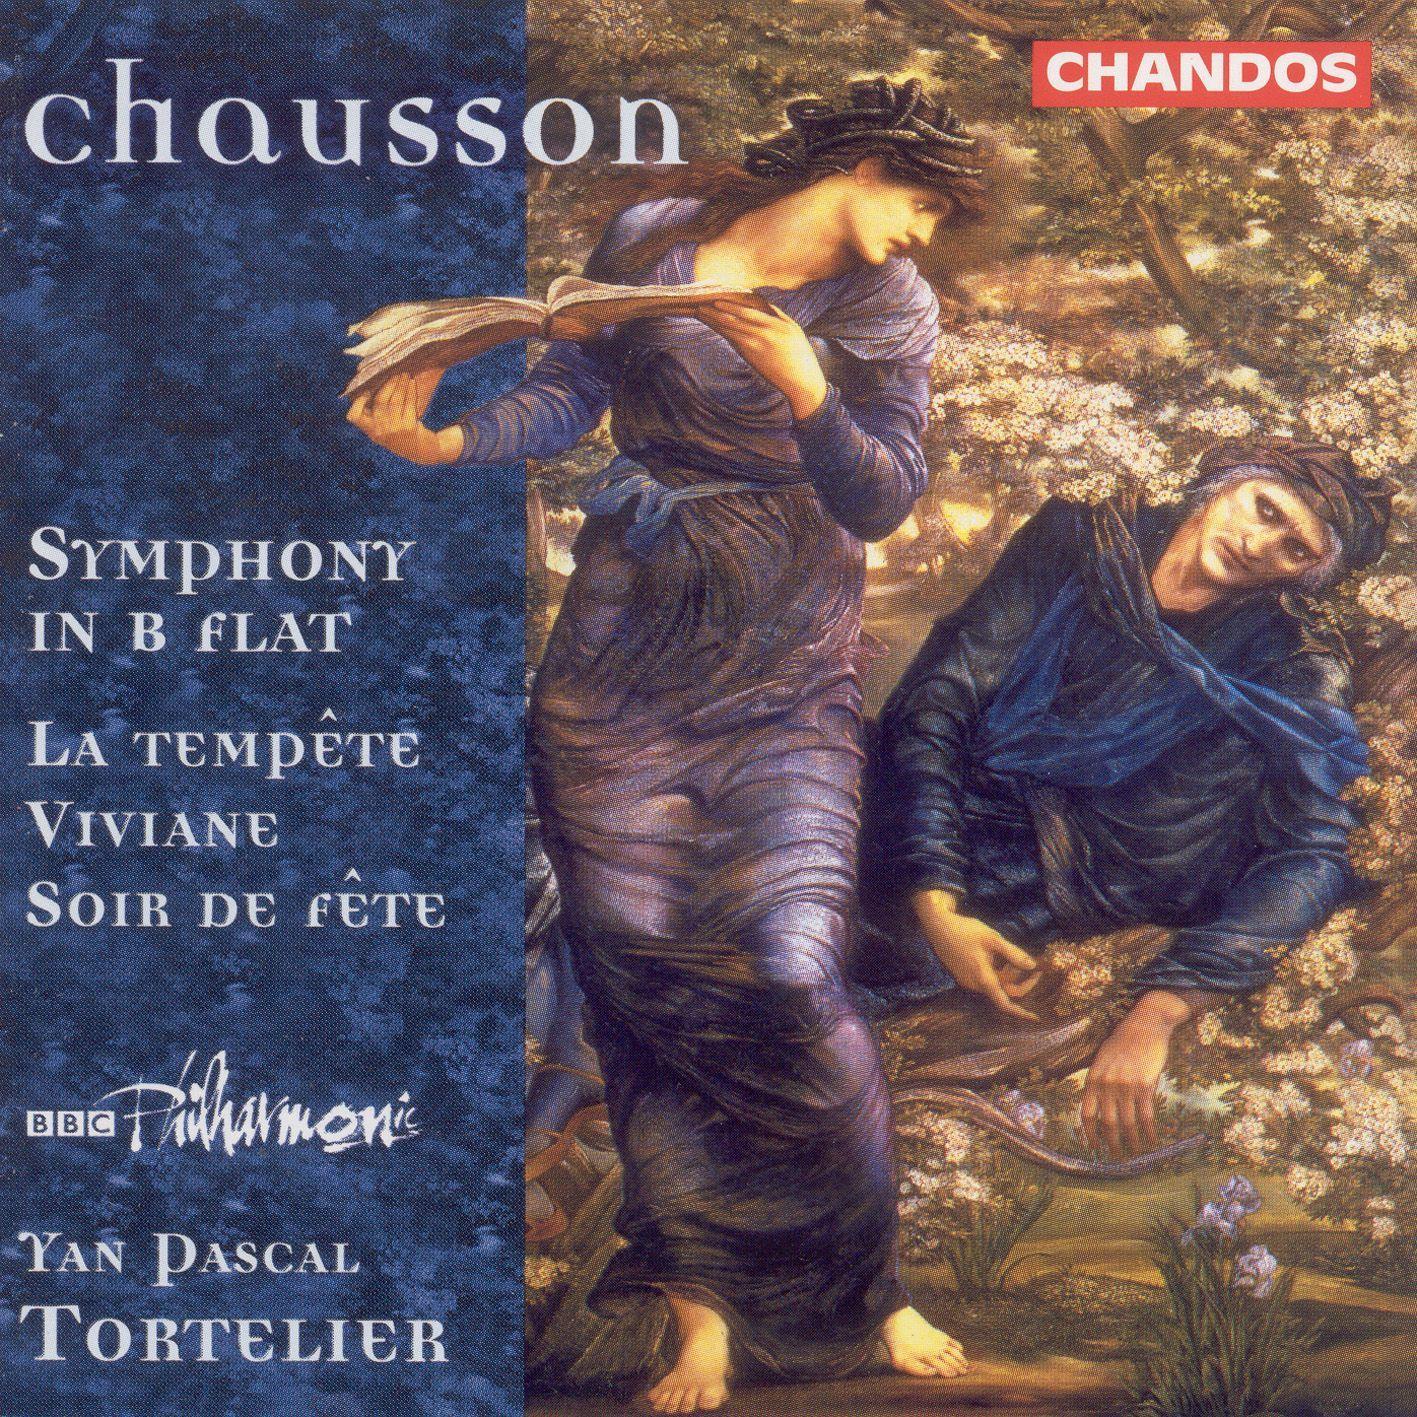 BBC Philharmonic - Chausson:Symphony in b Flat